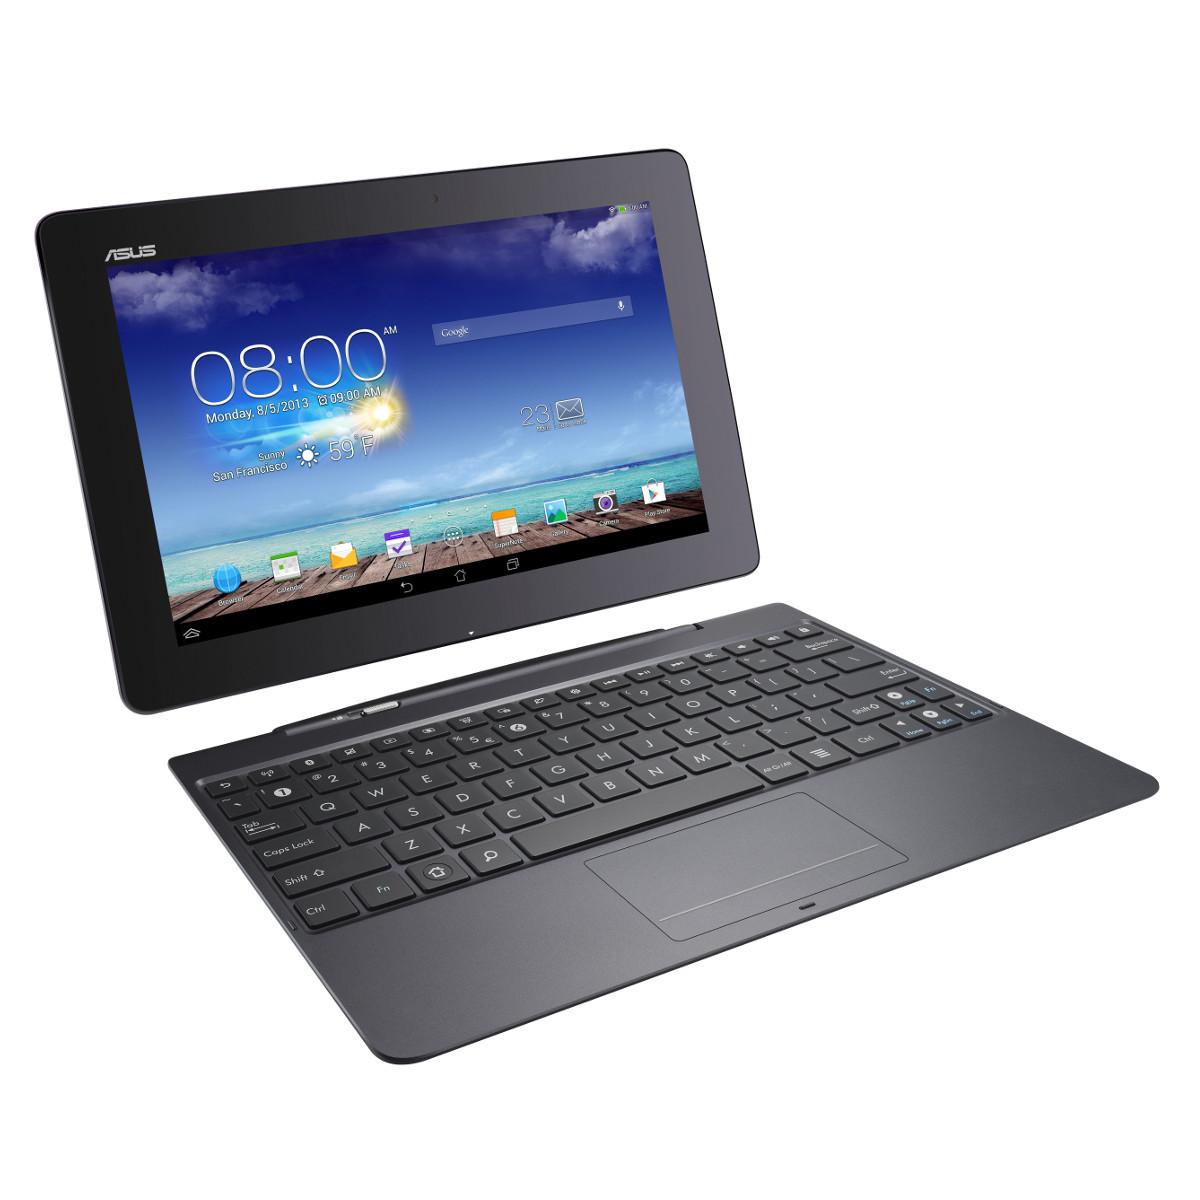 asus transformer pad tf701t 1b036a tablette tactile 10 1. Black Bedroom Furniture Sets. Home Design Ideas